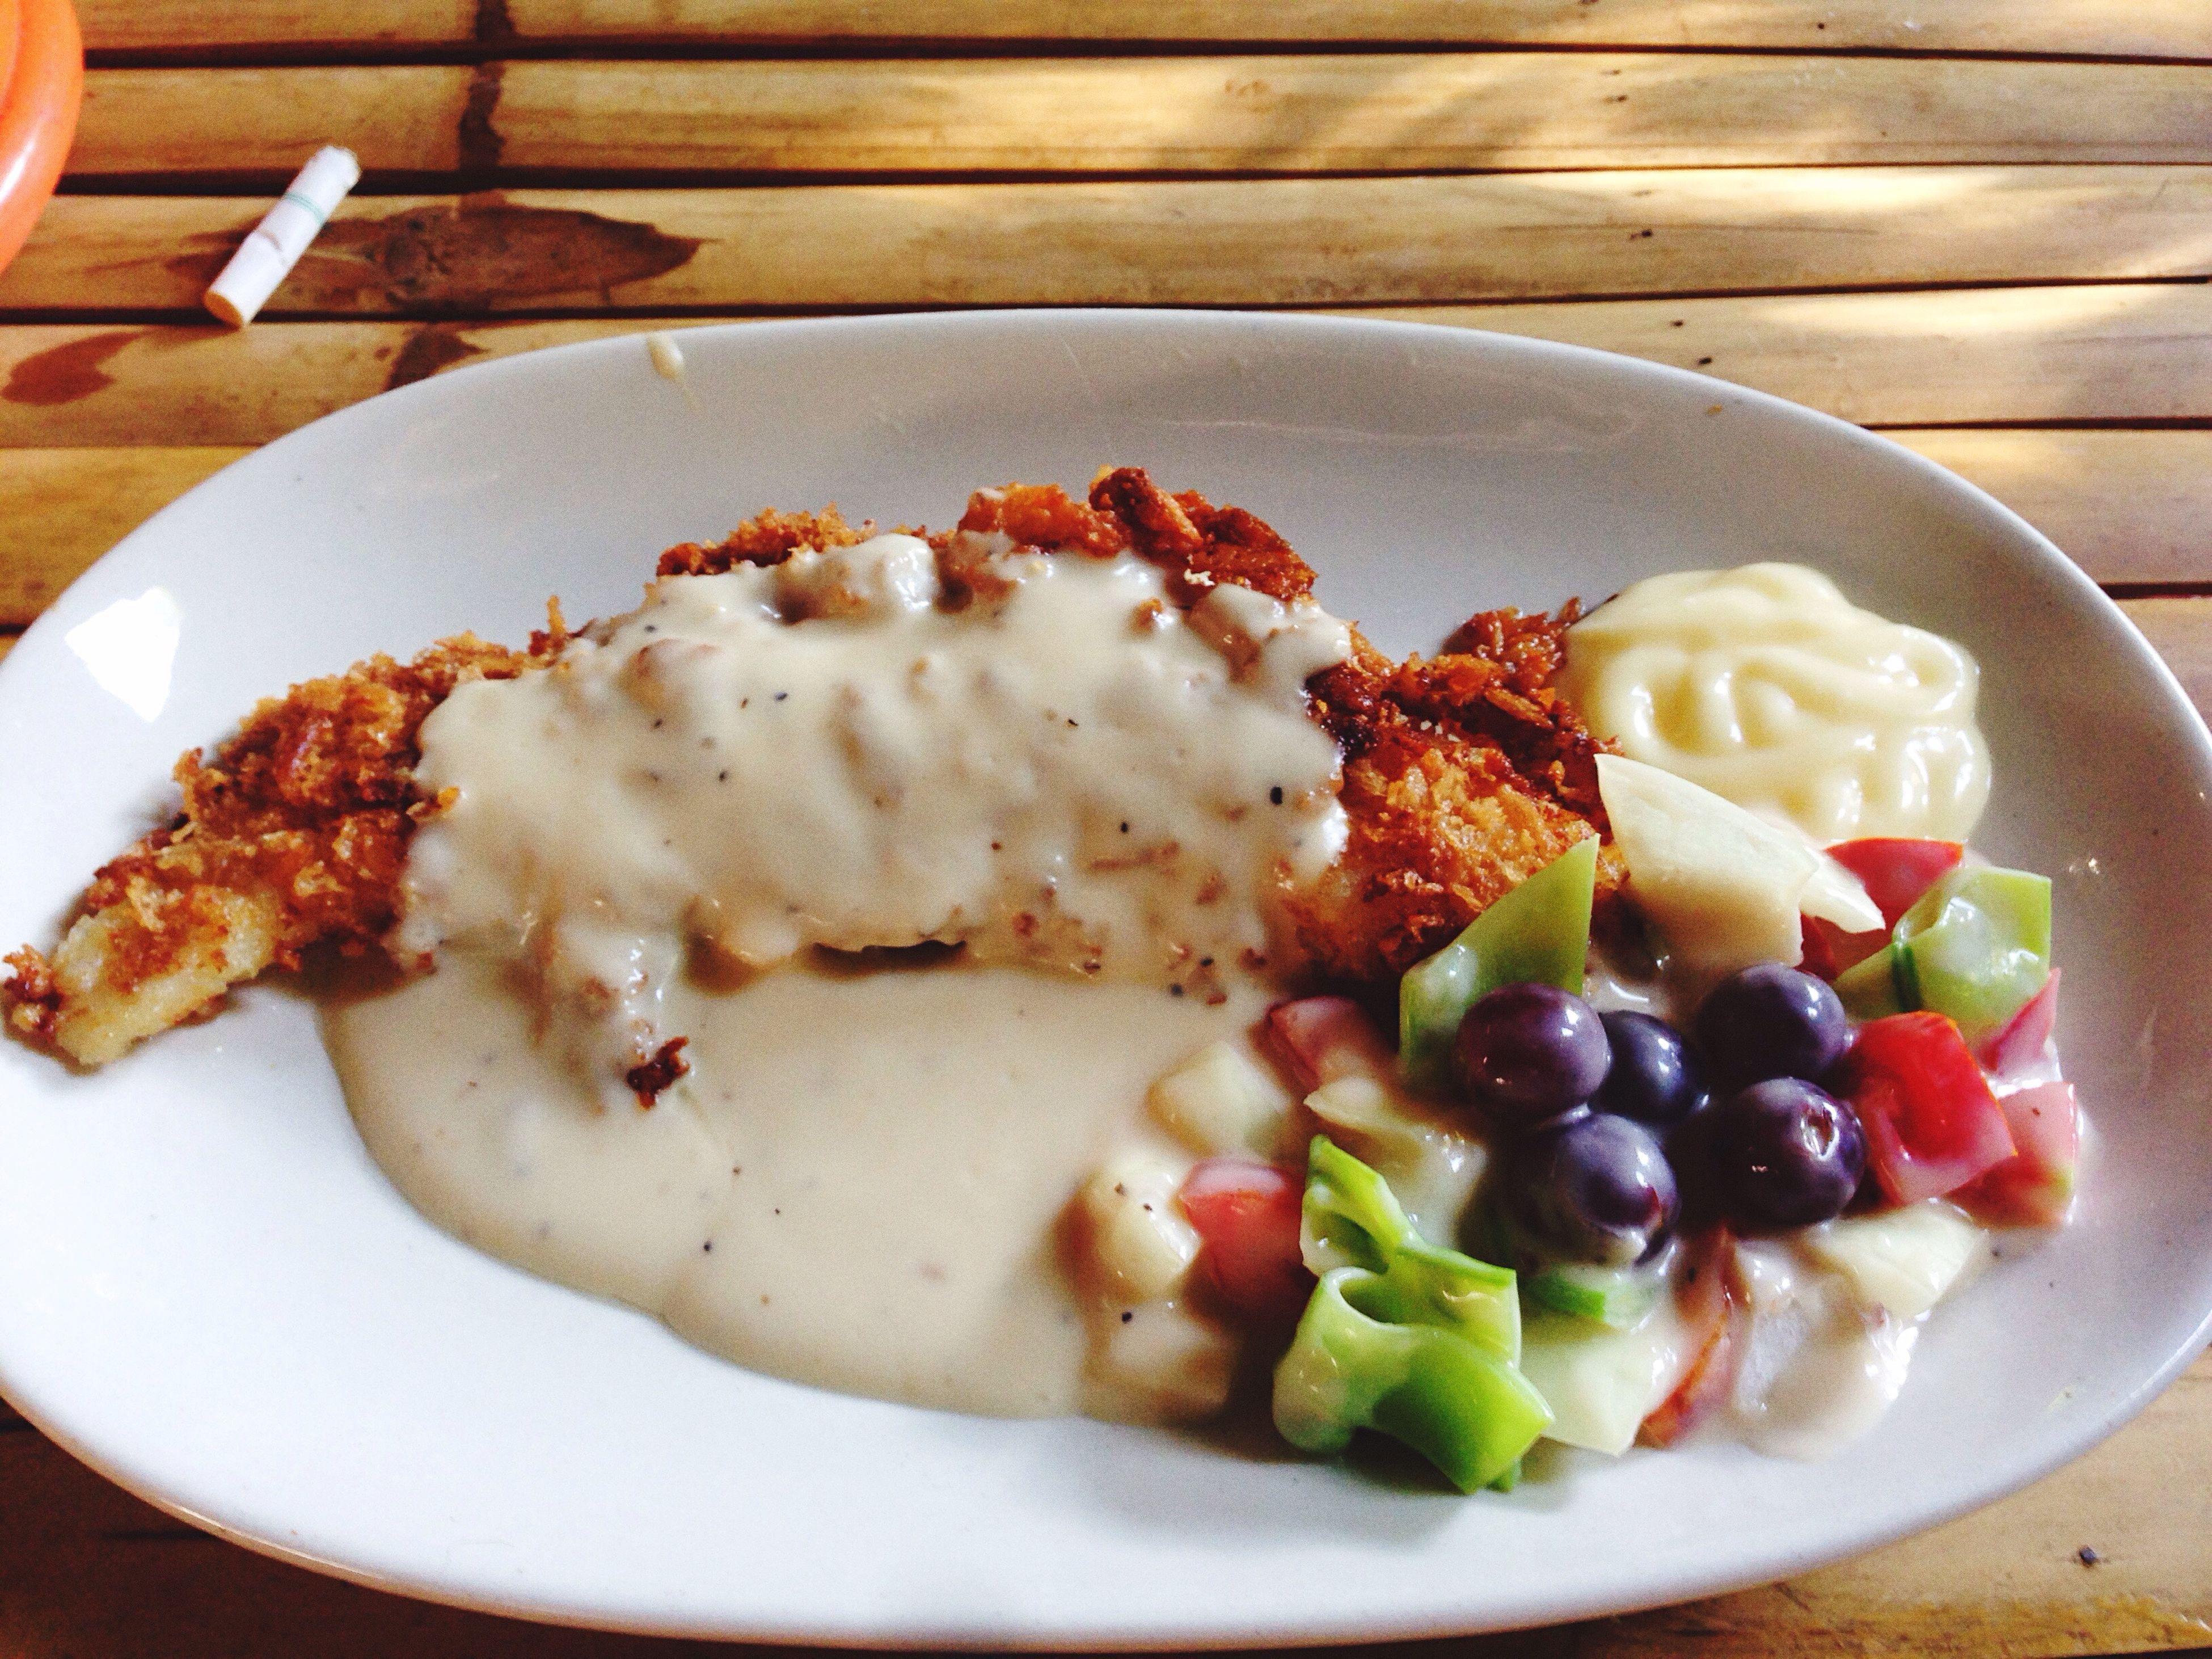 Fried fish and salad cream